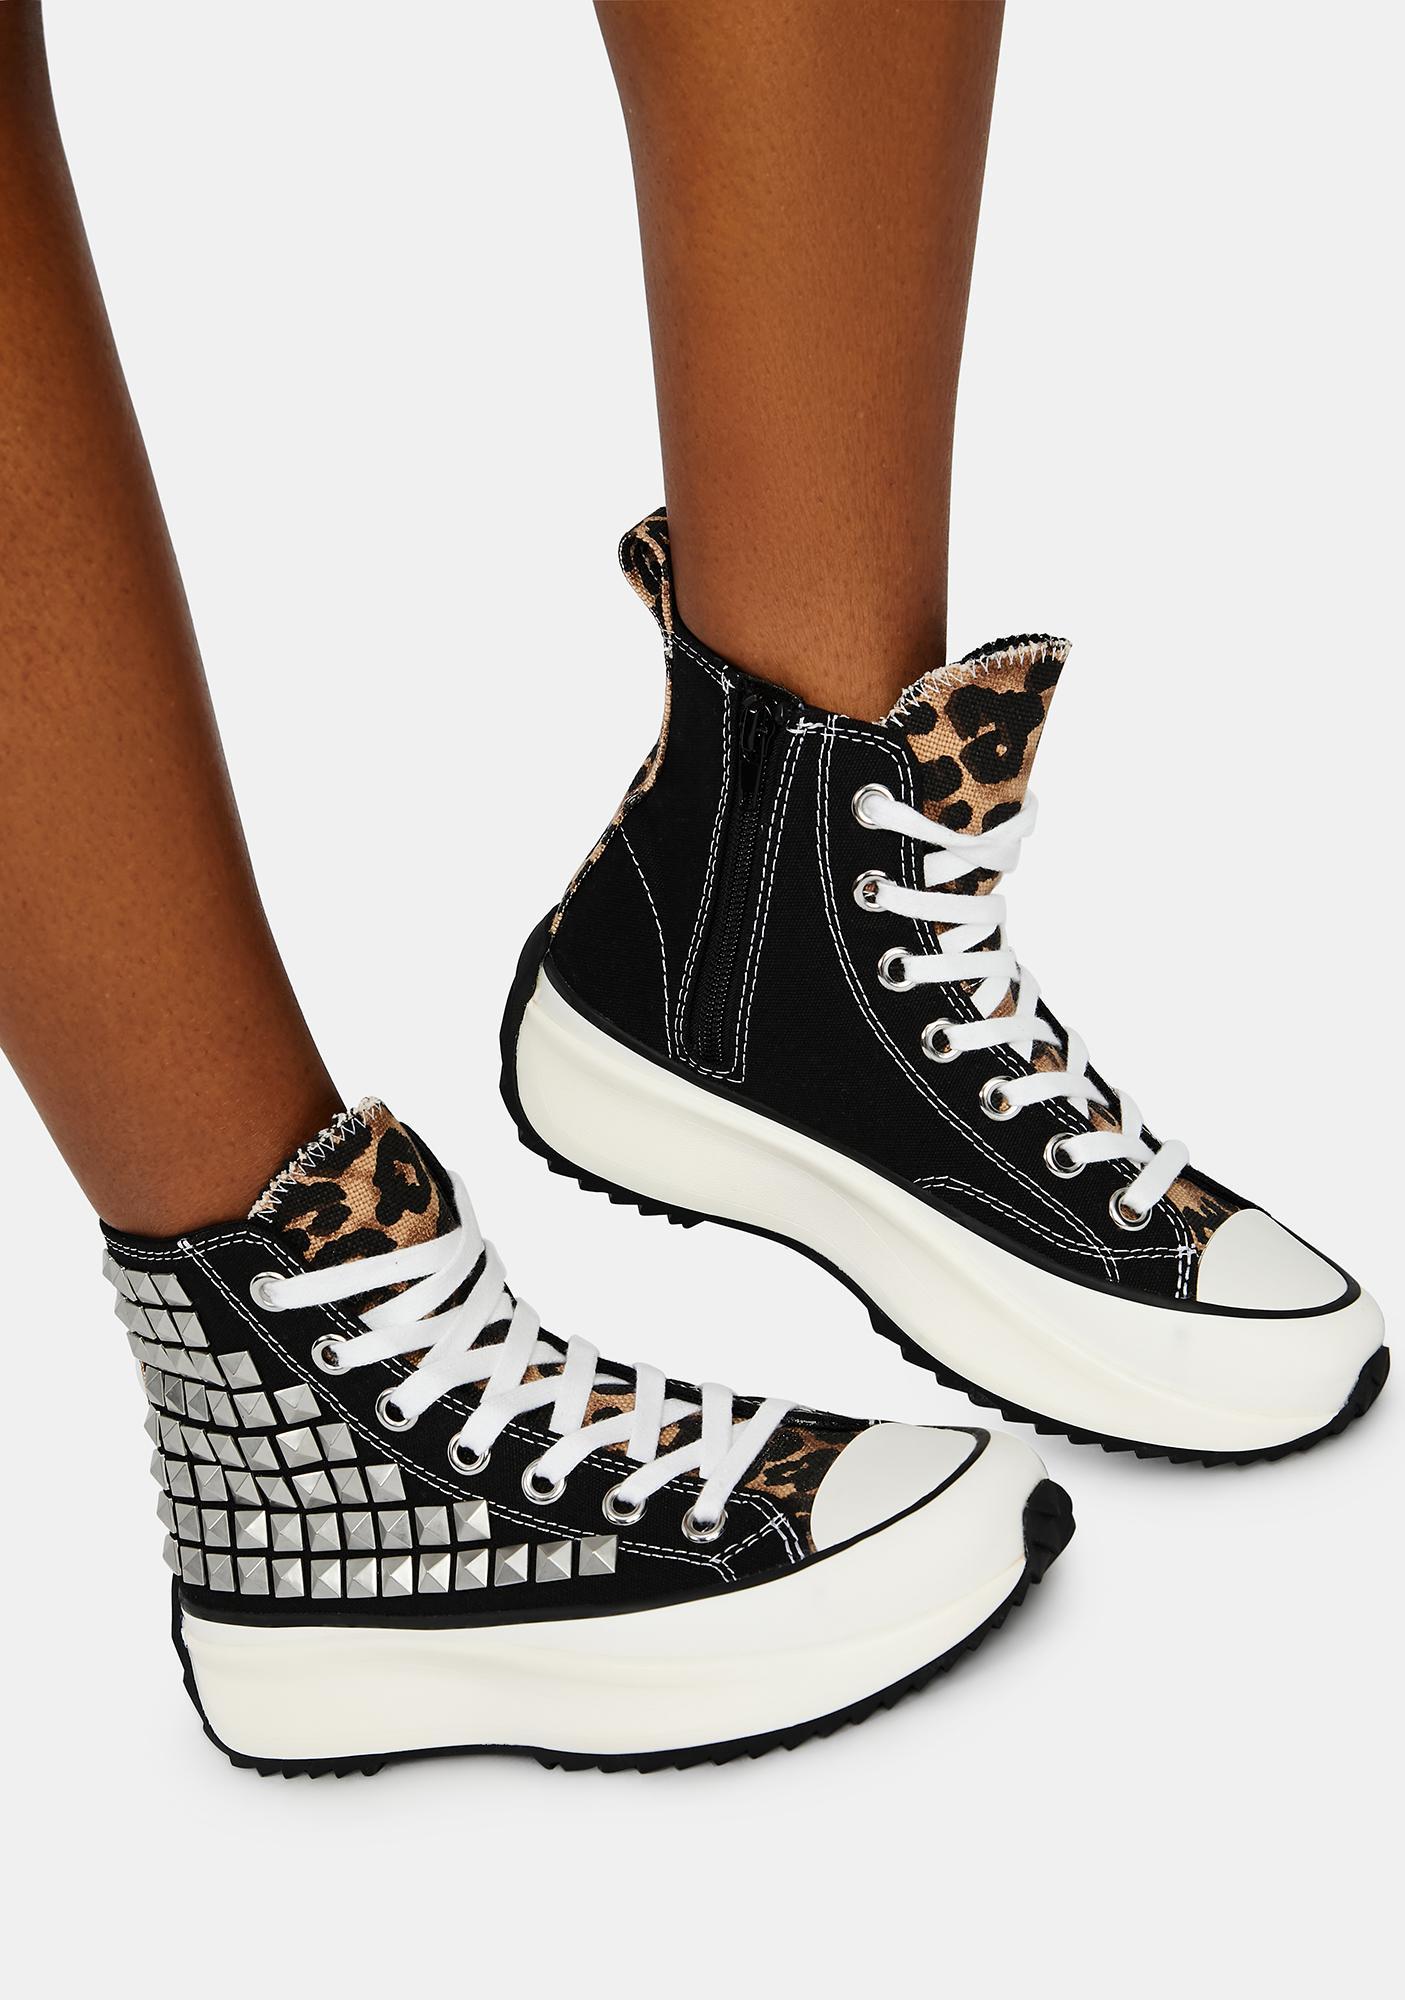 Steve Madden Shaft Studded Platform Sneakers